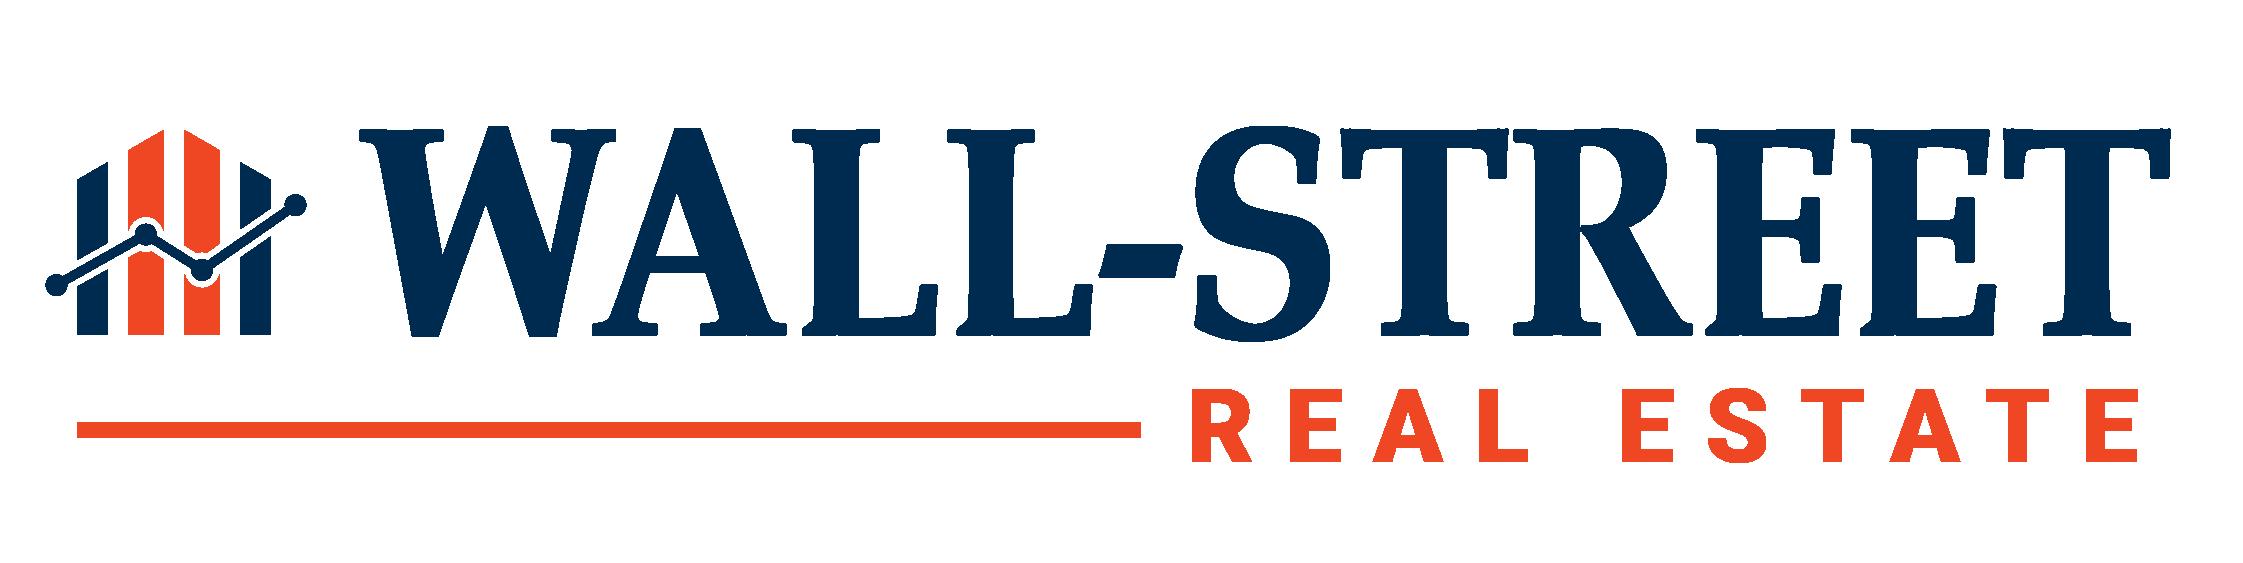 Imobiliare Wall-Street